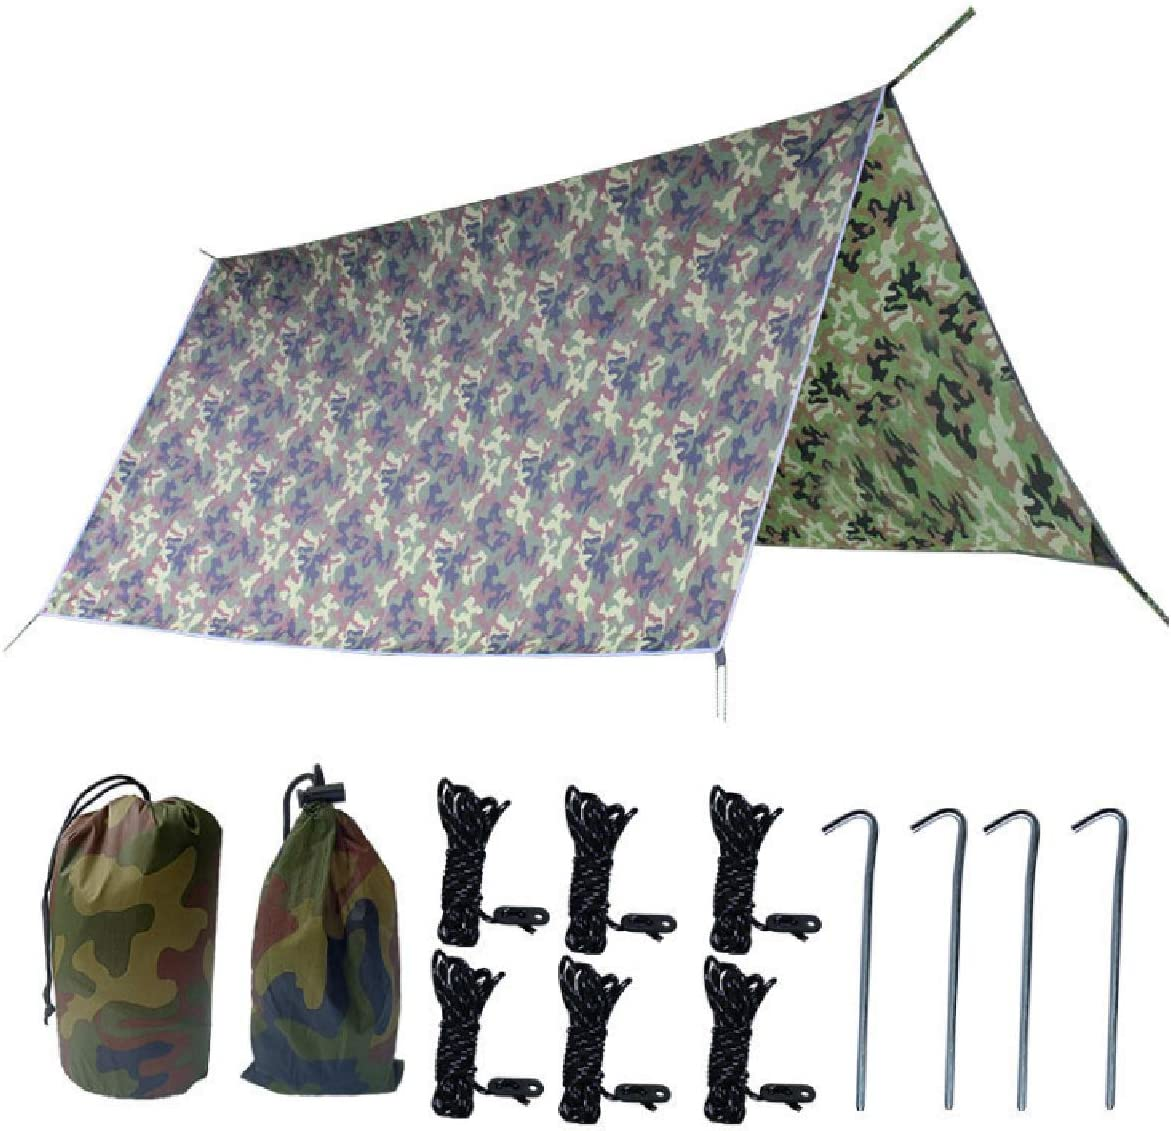 TRIWONDER Waterproof Hammock Rain Fly Tent Tarp Footprint Camping Shelter Ground Cloth Sunshade Mat for Outdoor Hiking Beach Picnic